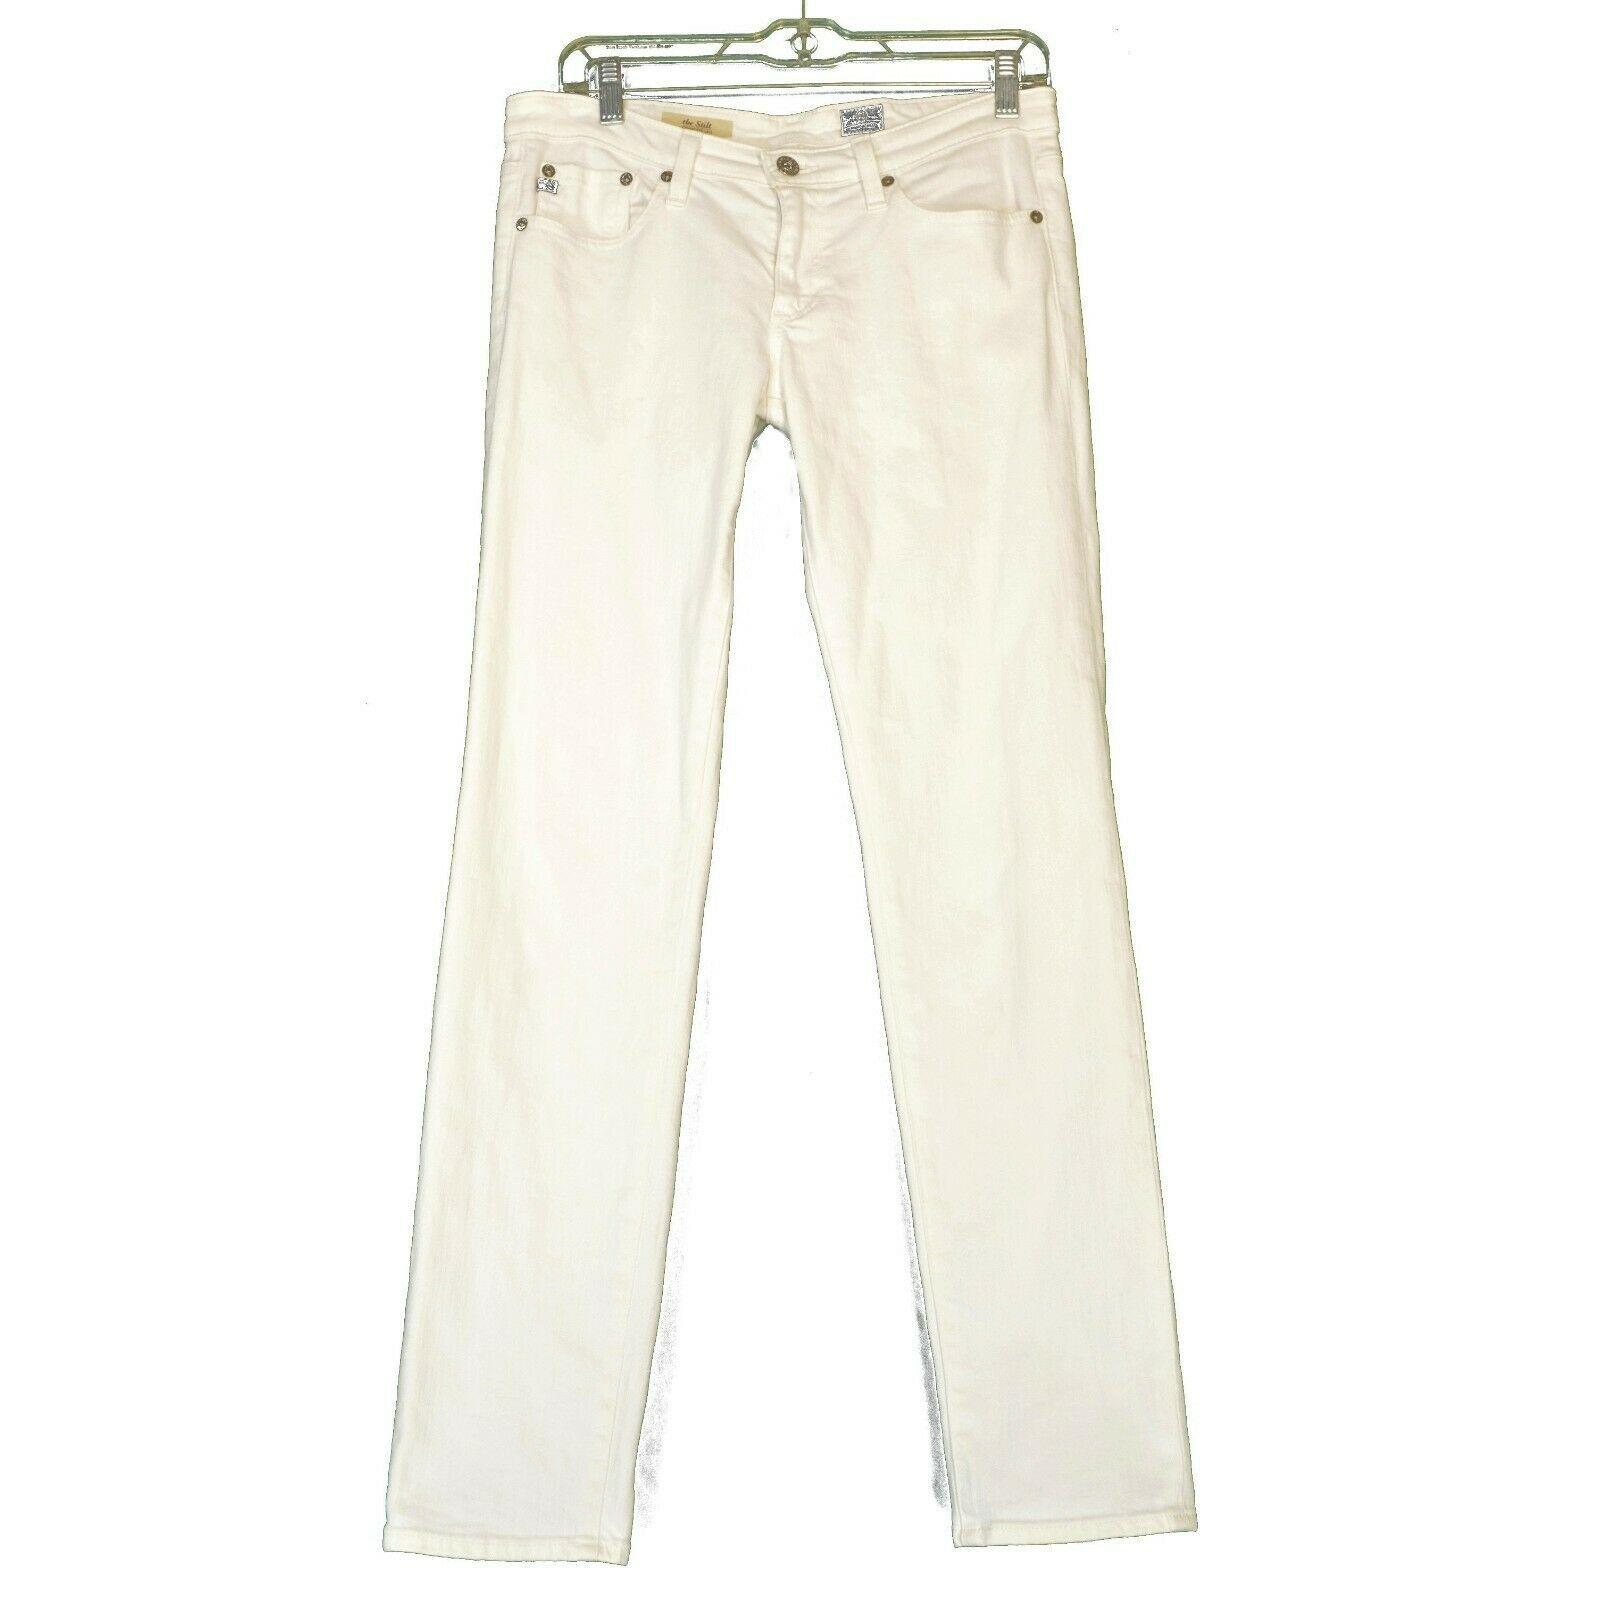 AG Adriano Goldschmied jeans 29 x 31 Stilt cigarette leg White thick EUCUSA